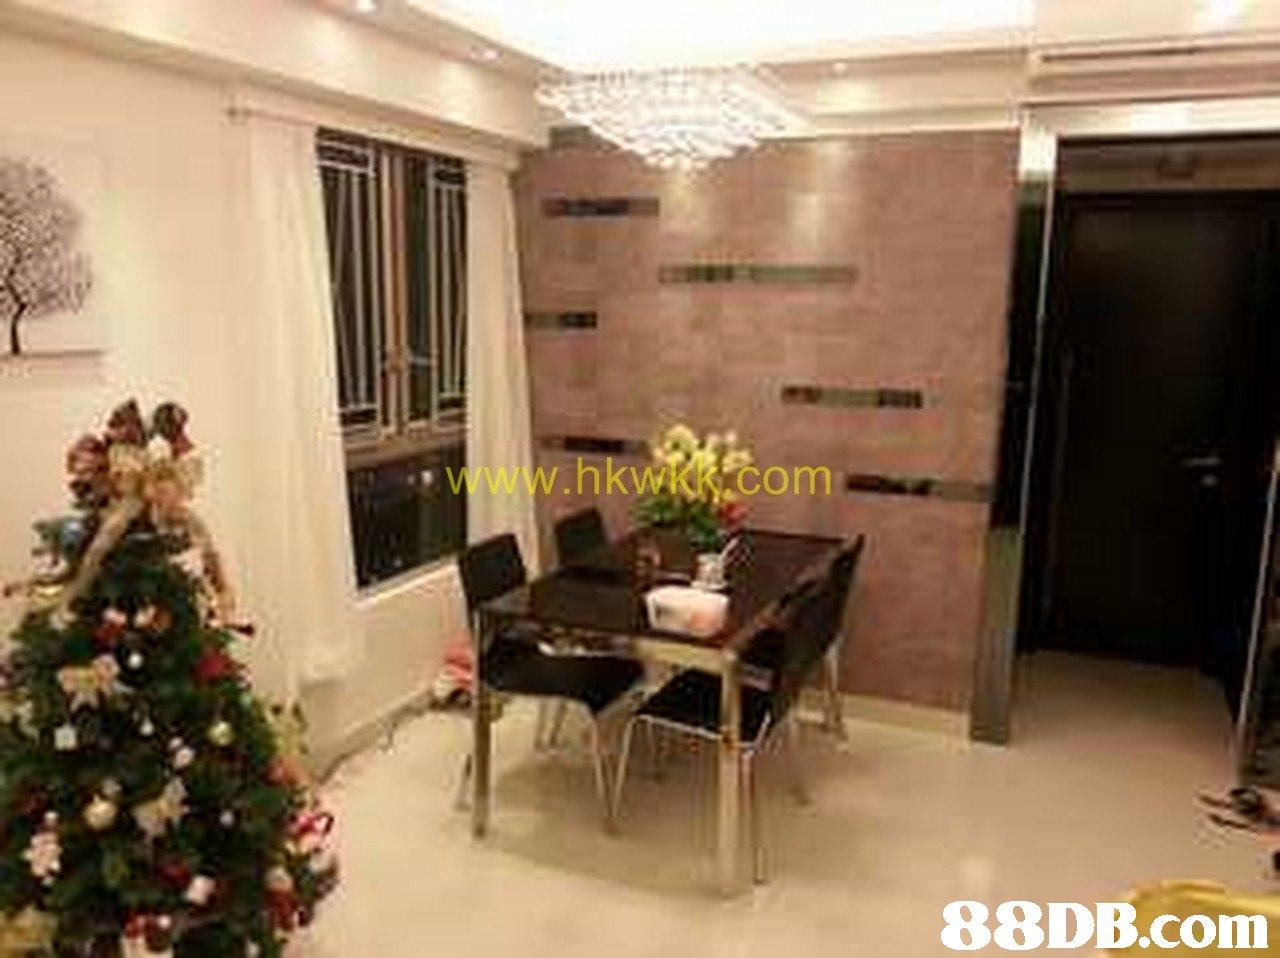 www.hkwkk.com   property,room,lobby,apartment,real estate